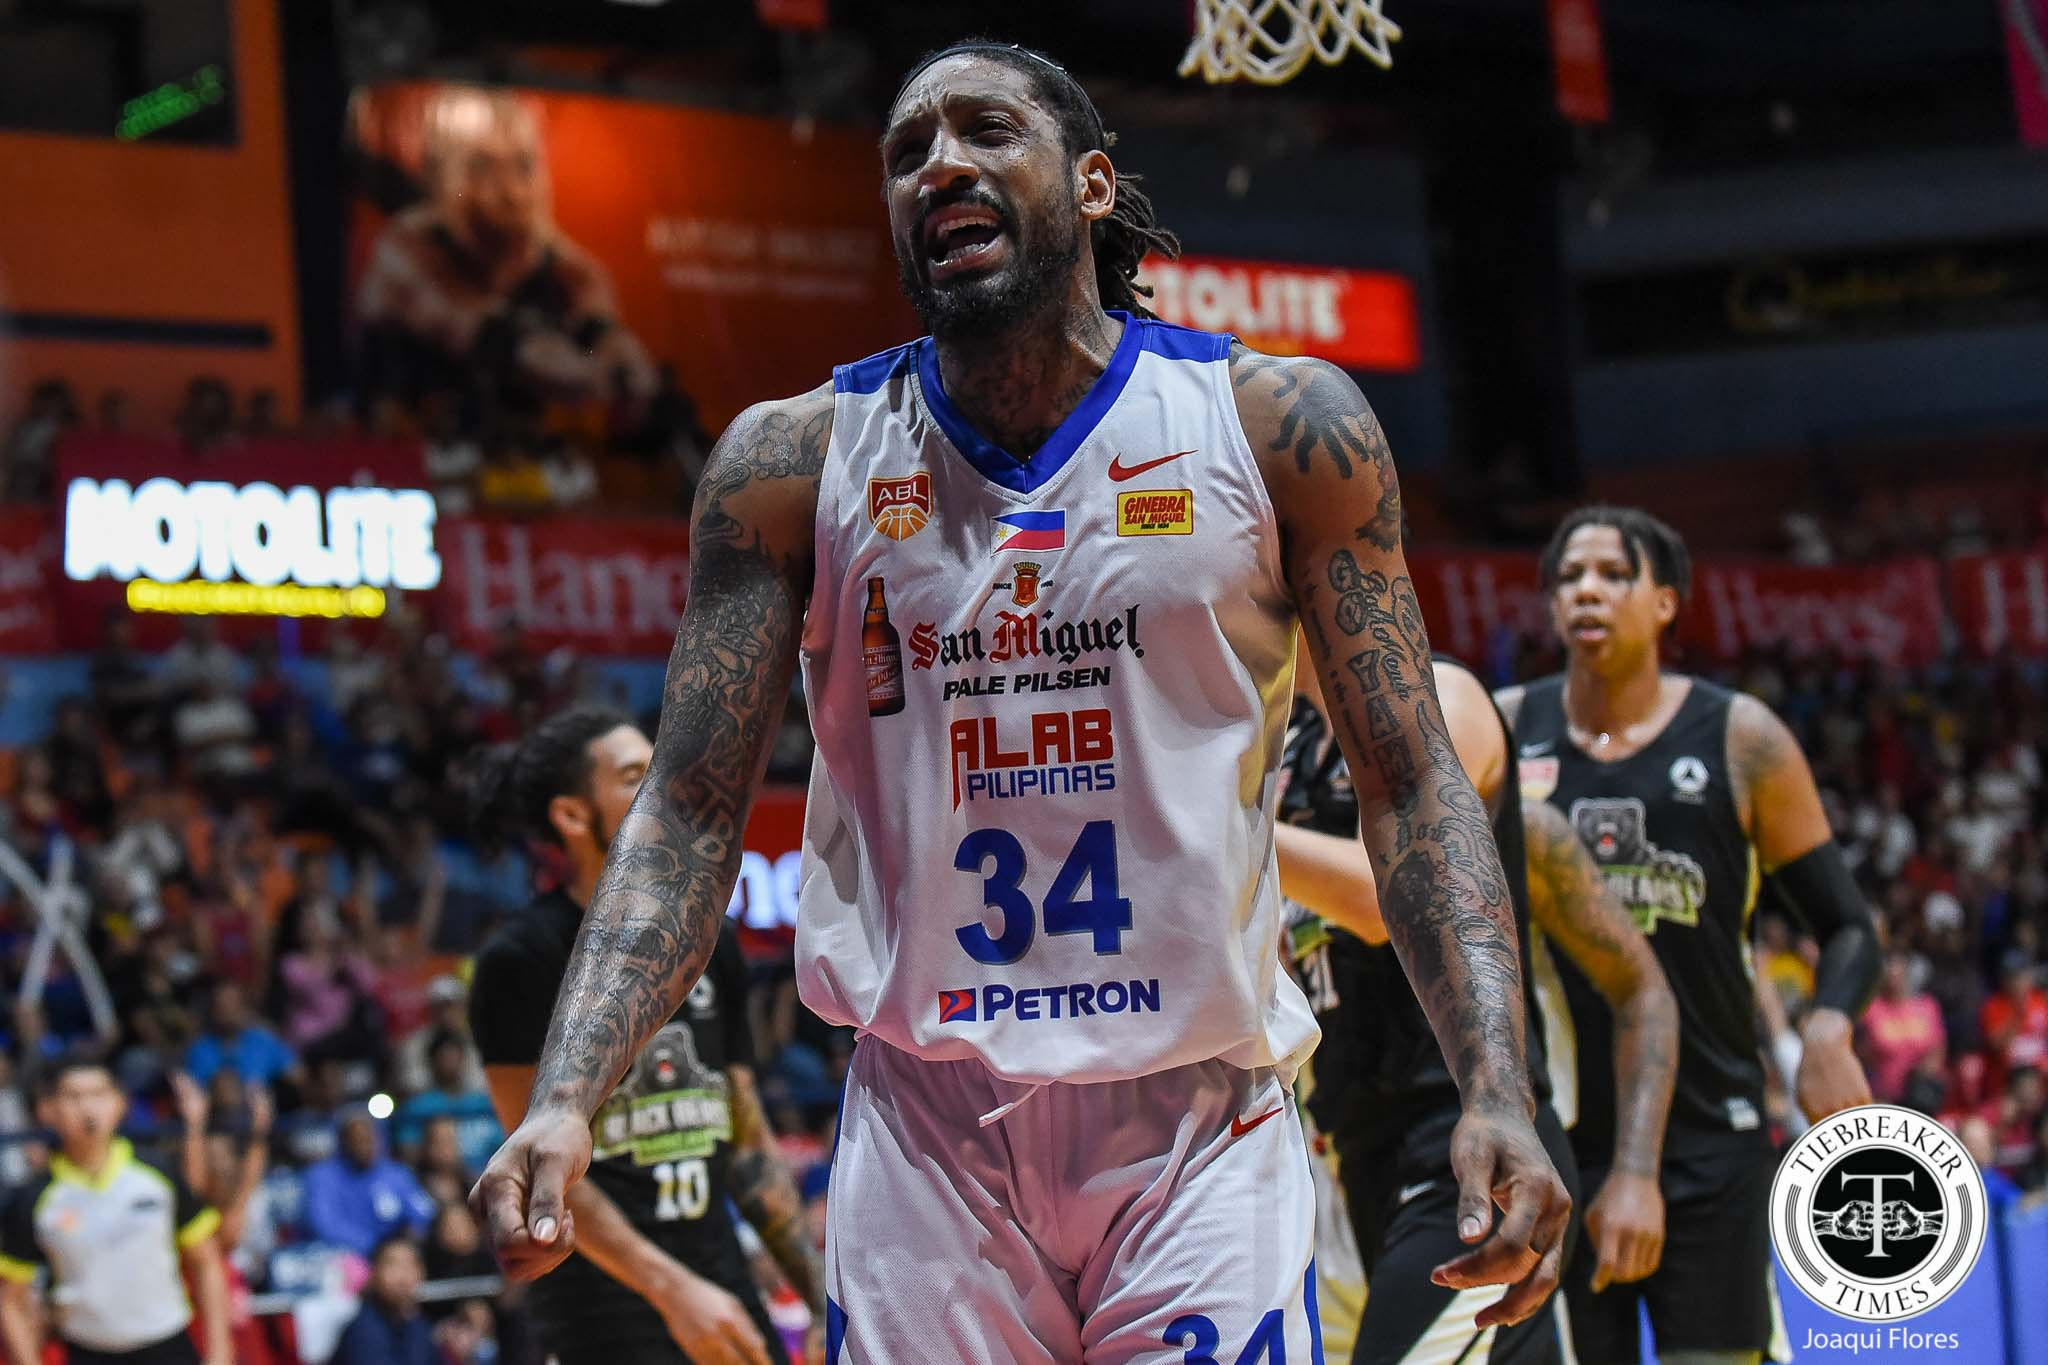 Tiebreaker Times Renaldo Balkman returns for third tour with Alab Pilipinas ABL Alab Pilipinas Basketball News  Renaldo Balkman 2019-20 ABL Season